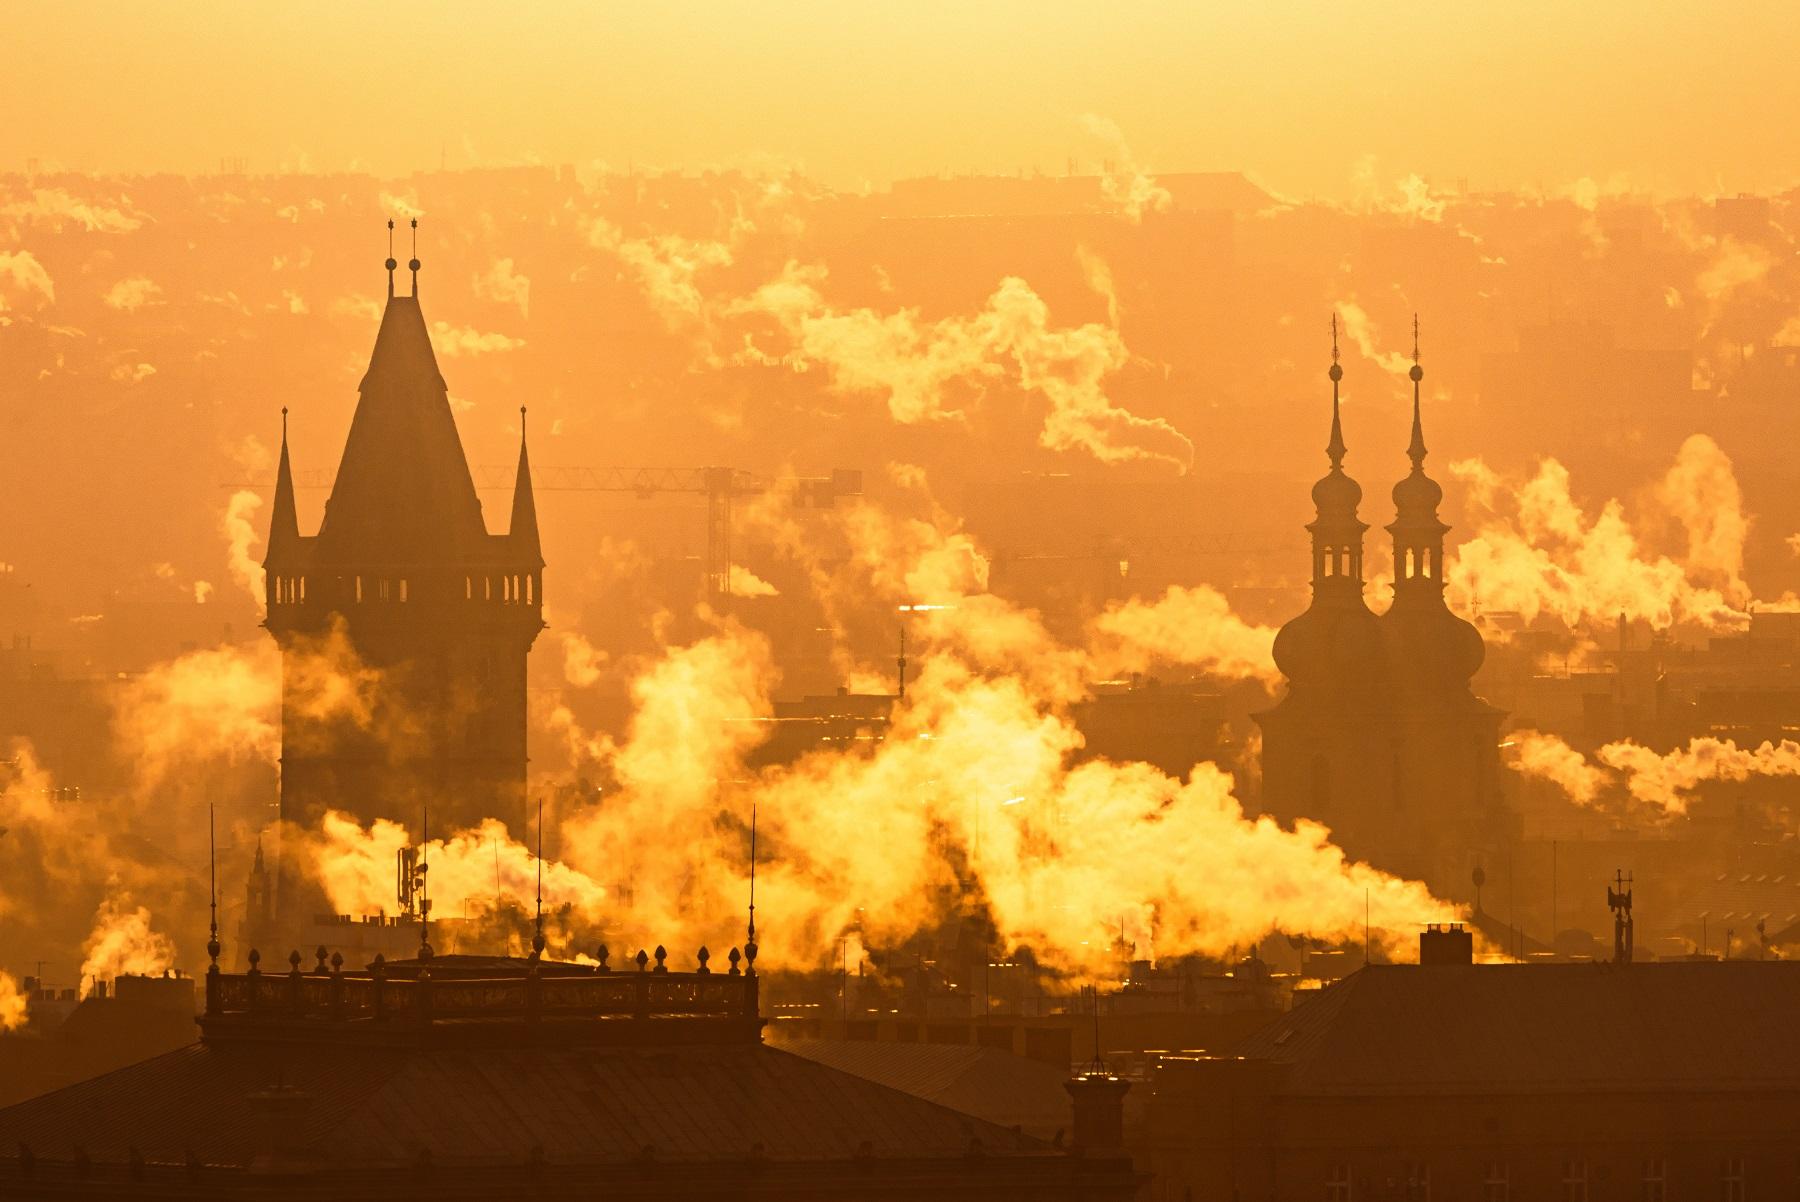 prague foggy sunrise czech republic SXR9U5J чехия чехия